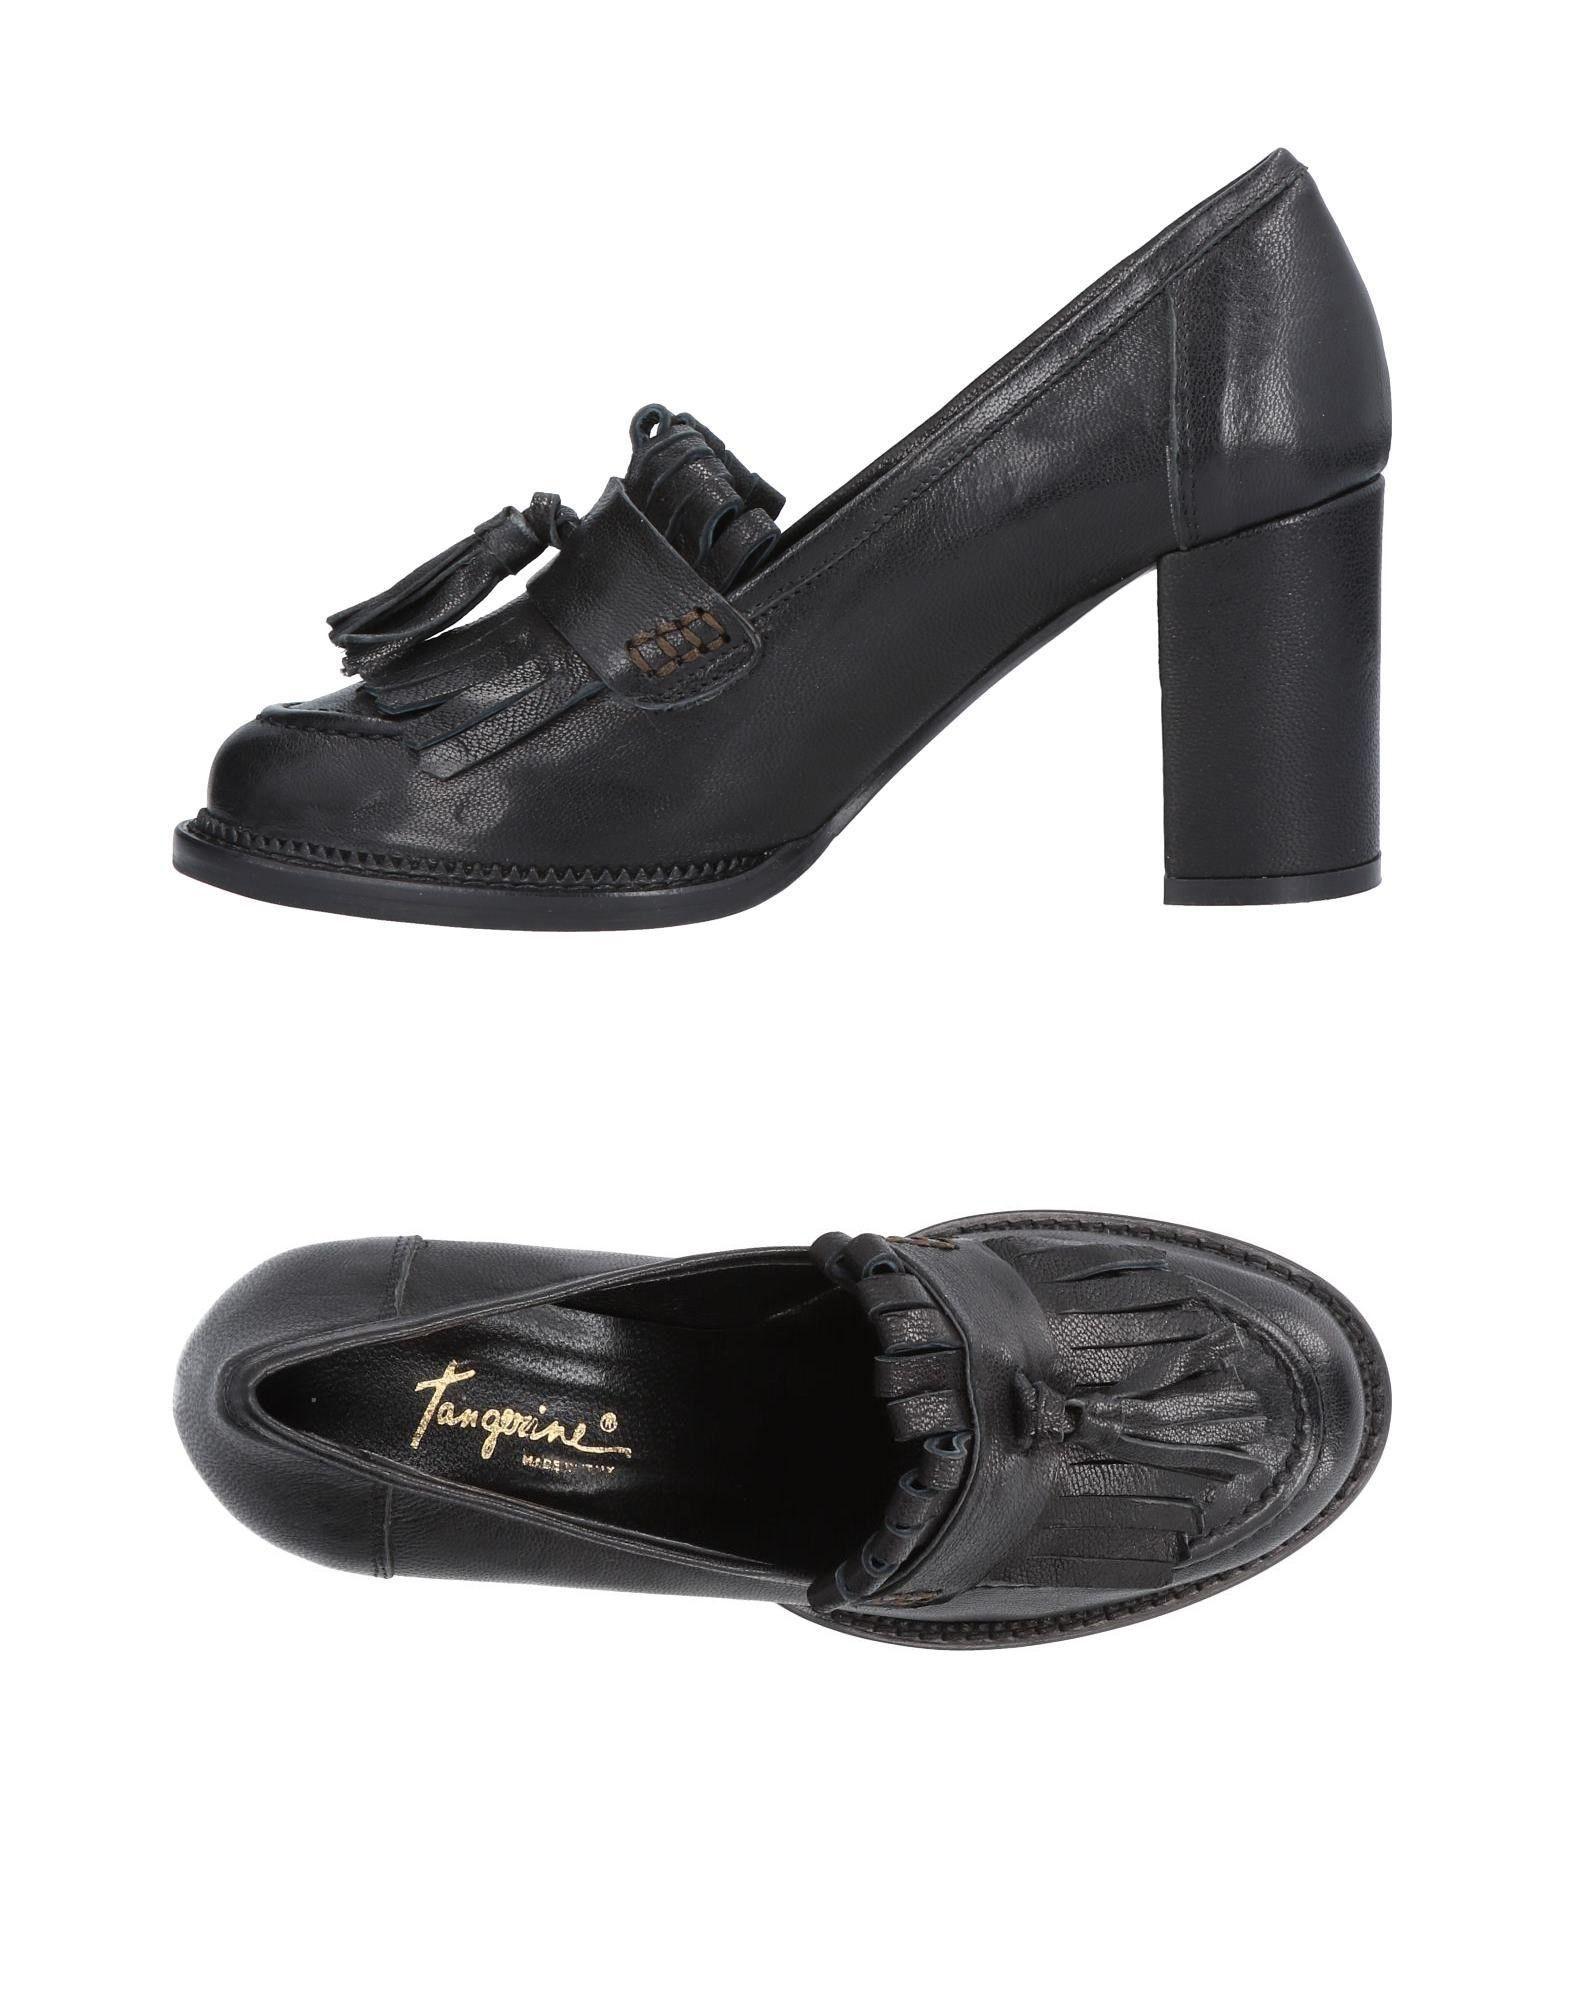 Tangerine Mokassins Damen  11473227WL Gute Qualität beliebte Schuhe